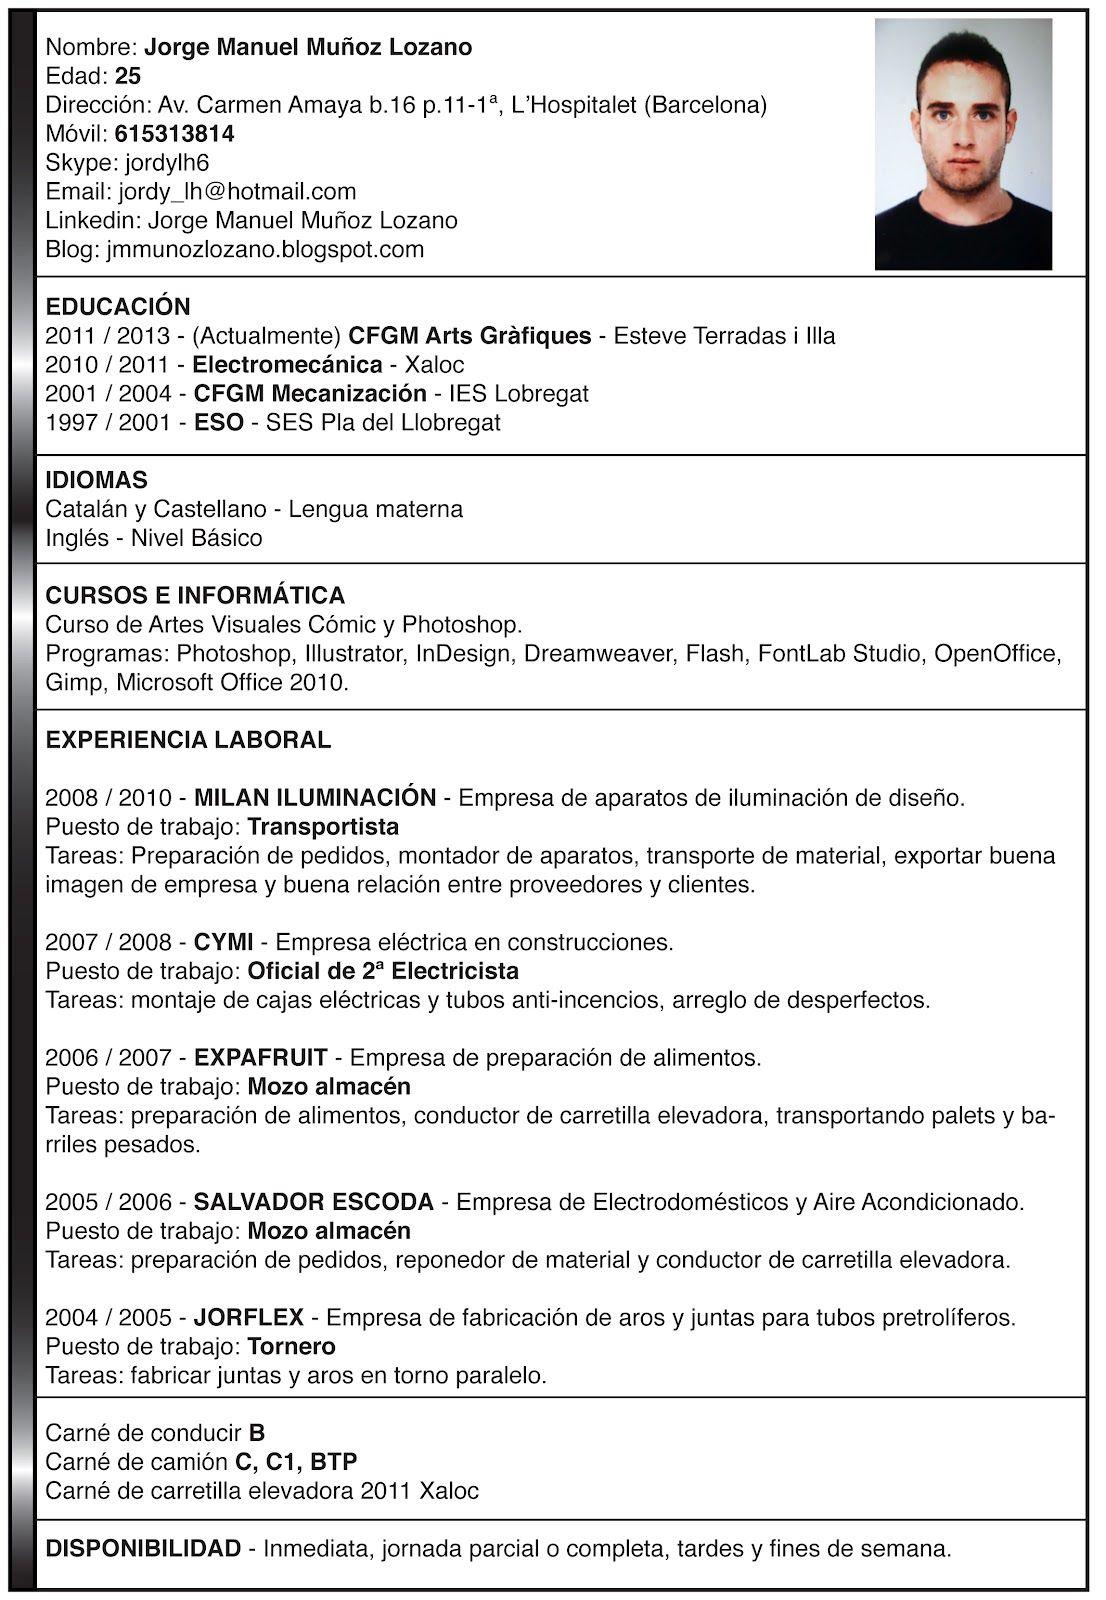 Hecho Ejemplos De Curriculum Vitae Modelos De Curriculum Vitae